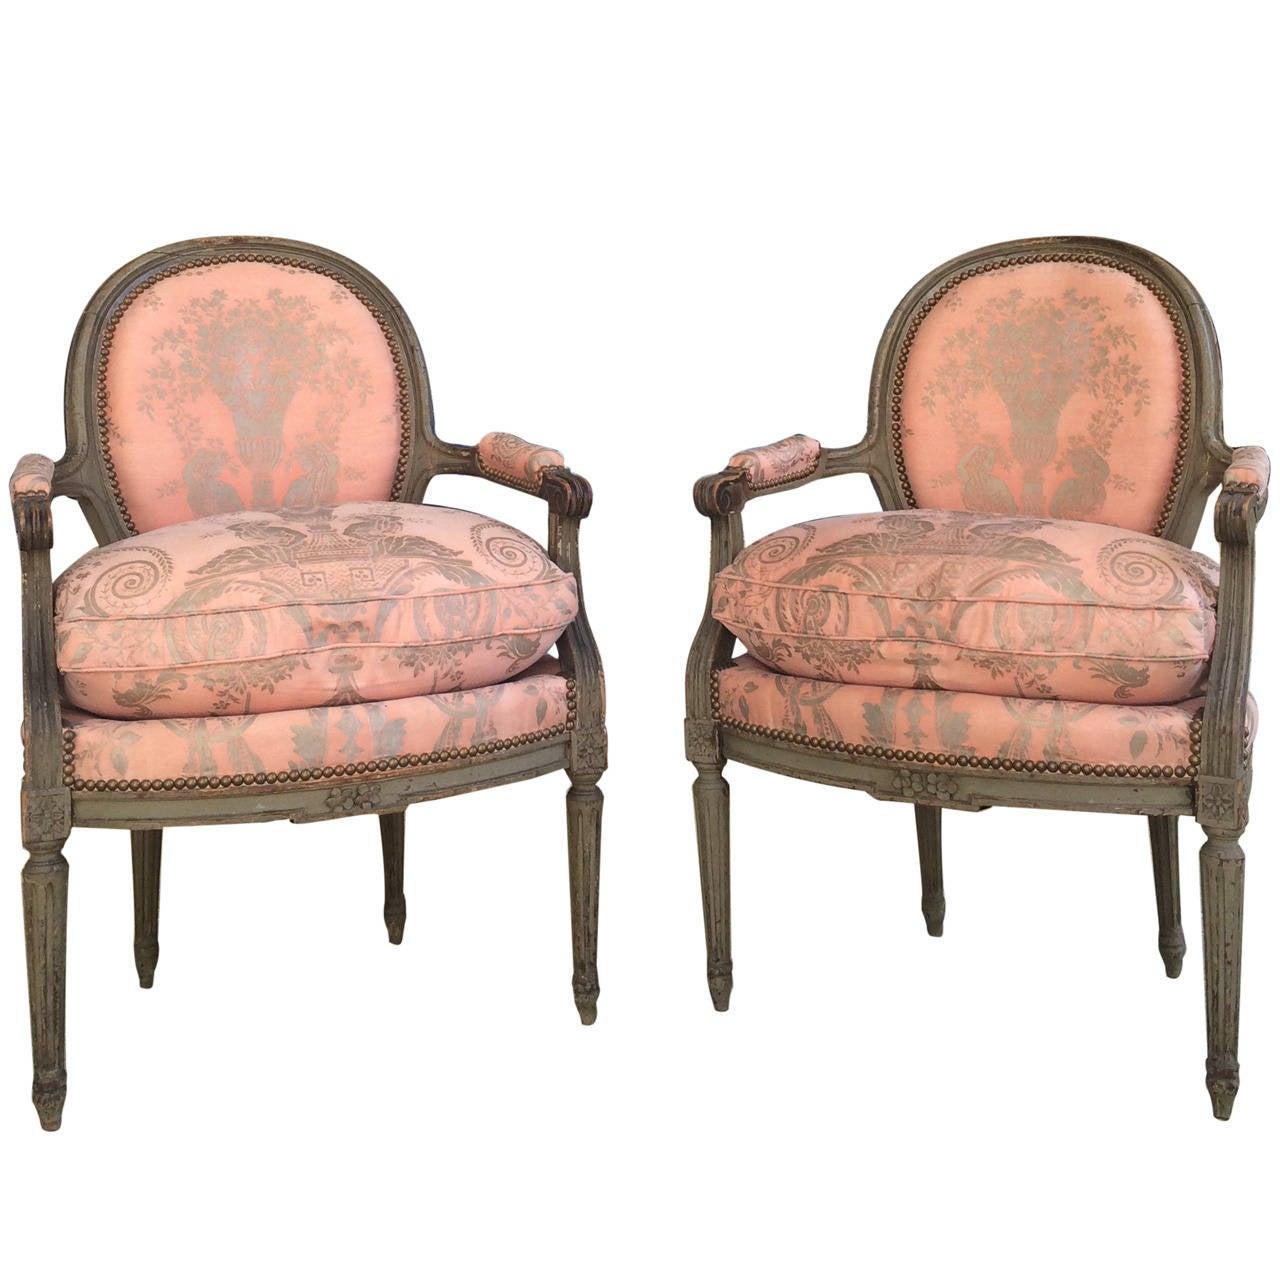 Beautiful Pair of Painted Louis XVI Fauteuils